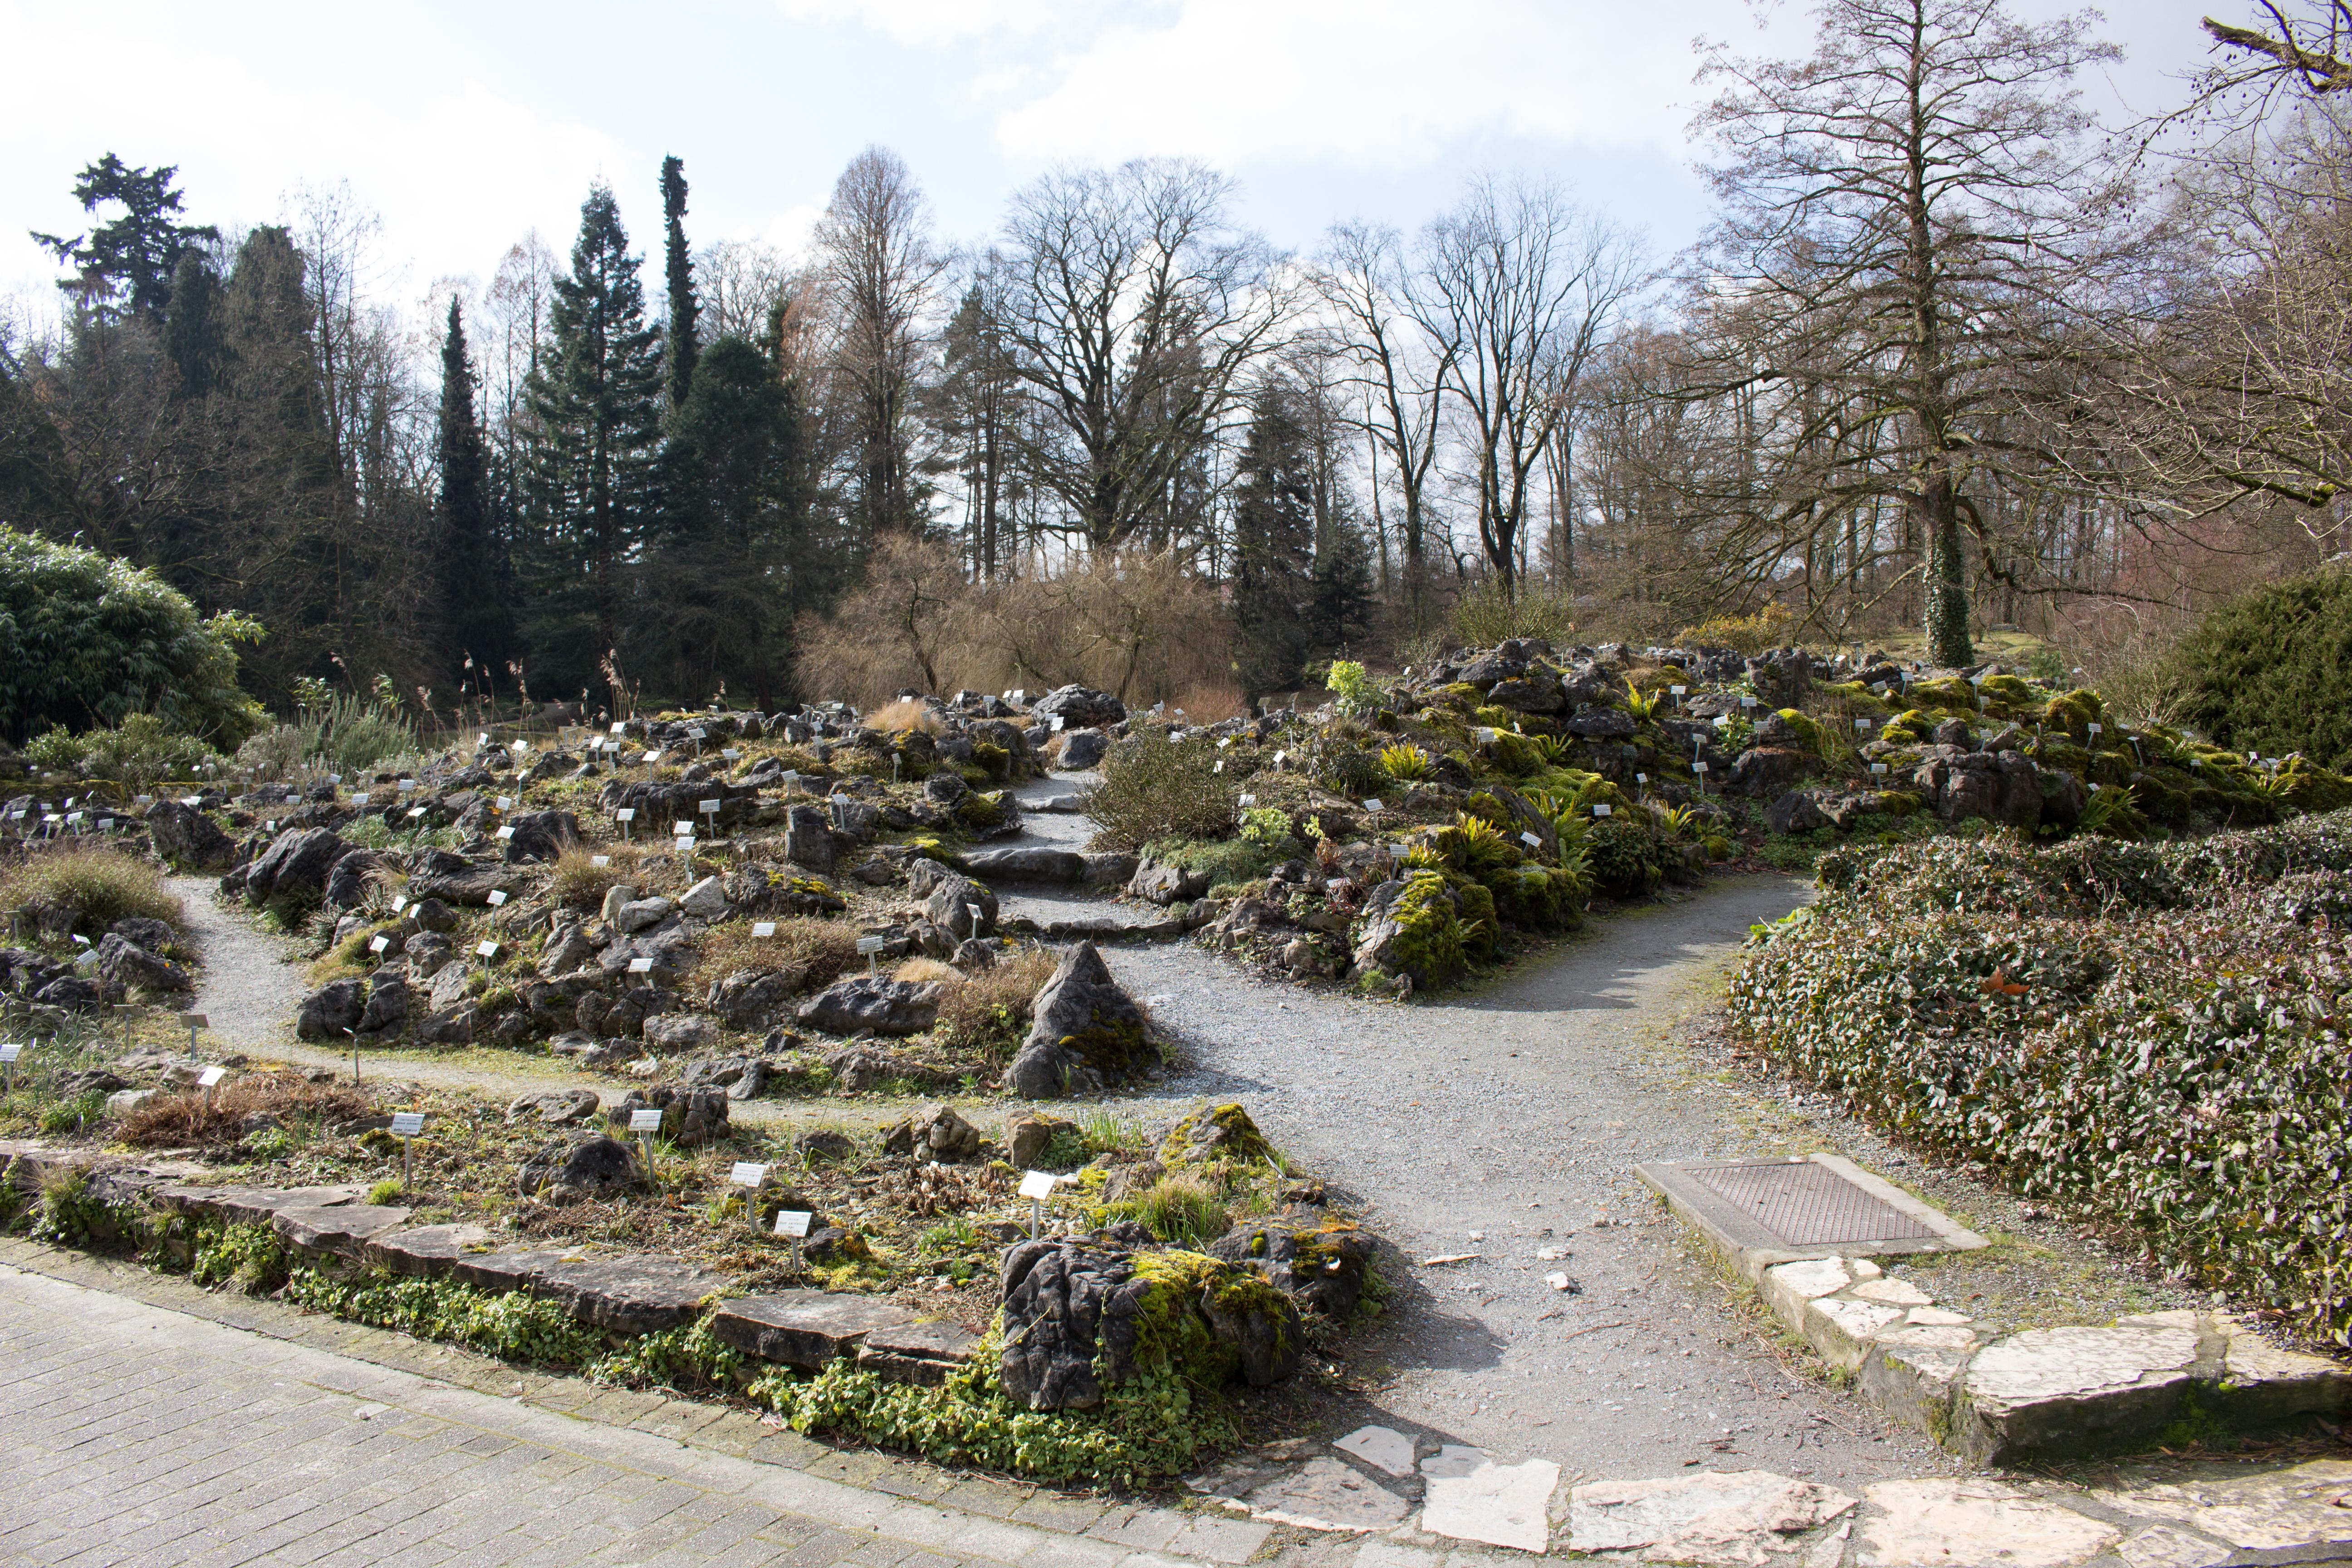 Garten Münster file münster schloss botanischer garten alpinum 01 jpg wikimedia